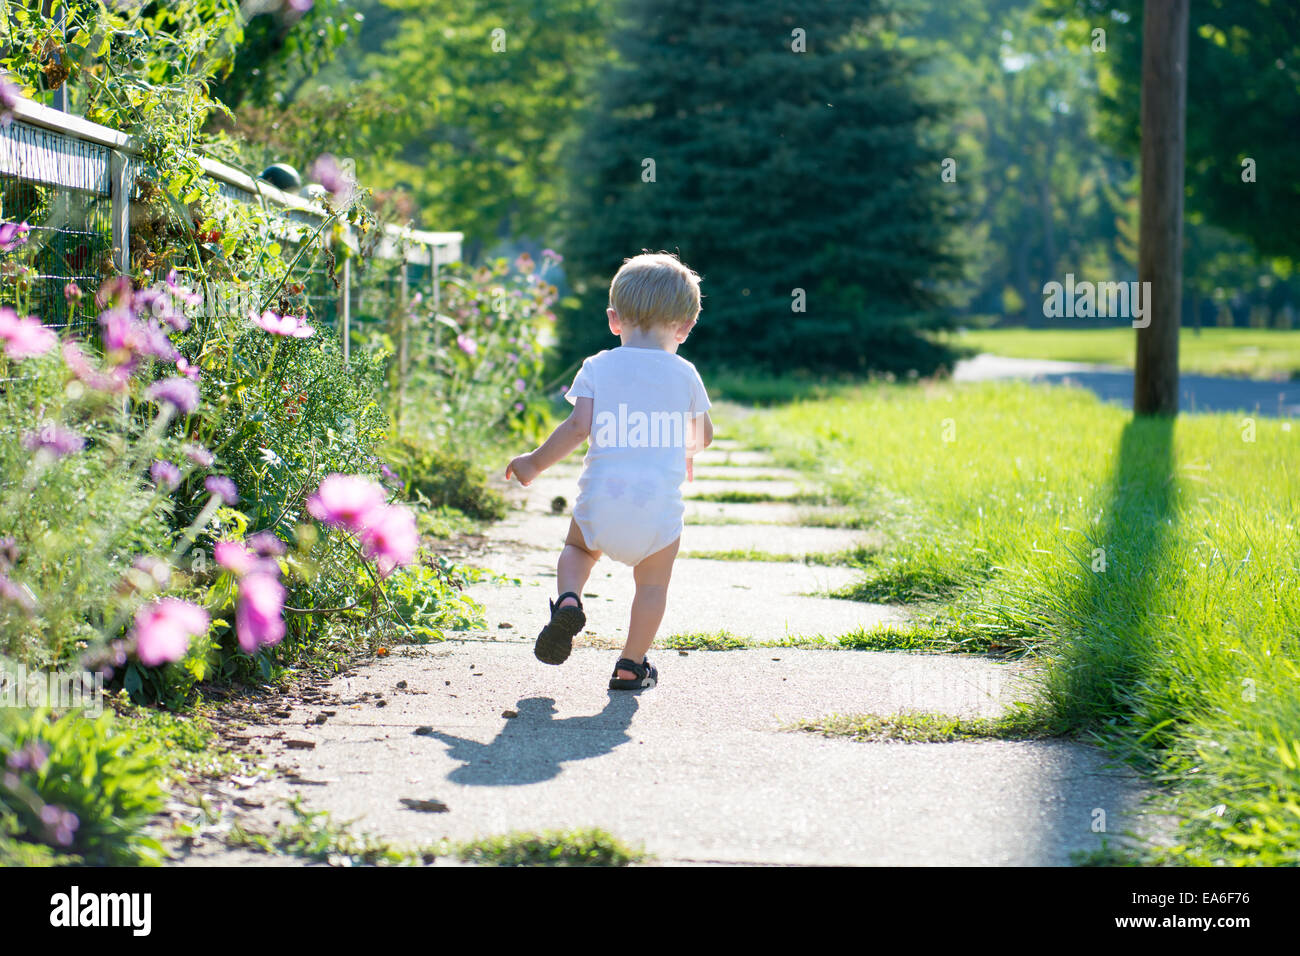 Boy running along sidewalk, Indiana, America, USA - Stock Image